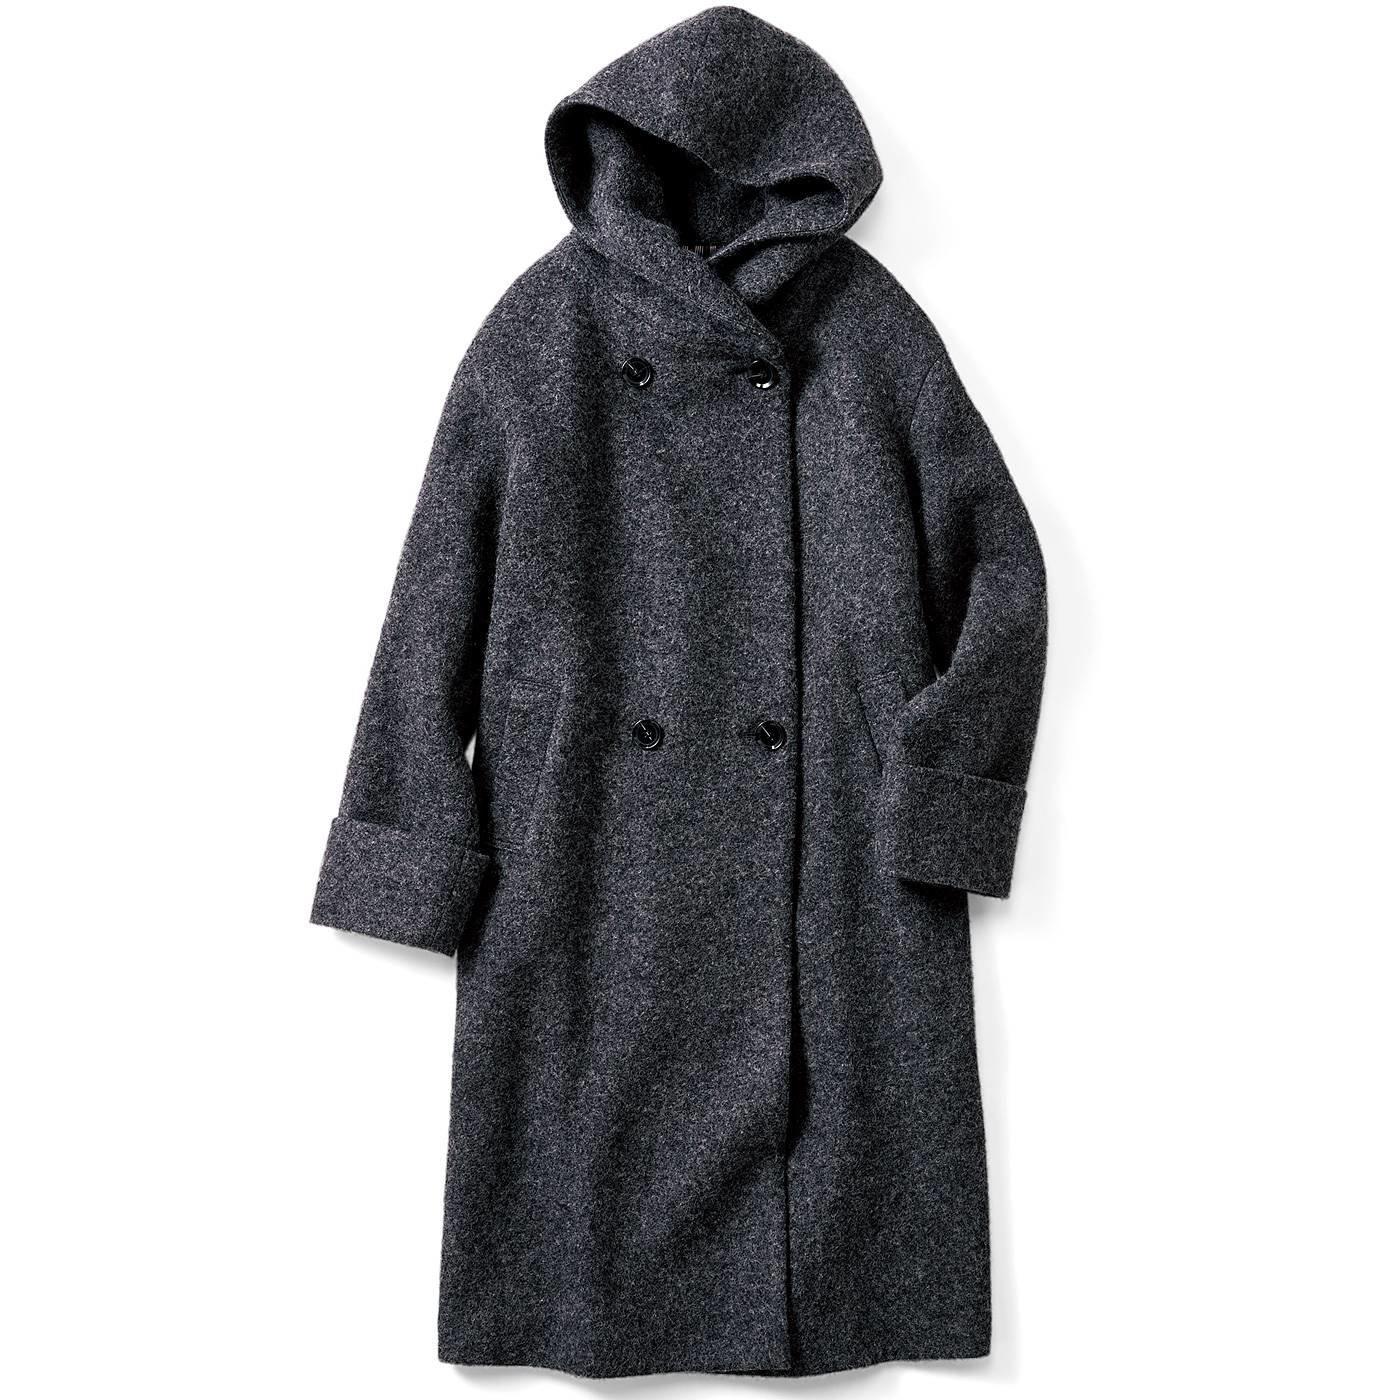 IEDIT スライバーニット素材で軽くて暖か フードデザイン毎日ロングコート〈グレー〉